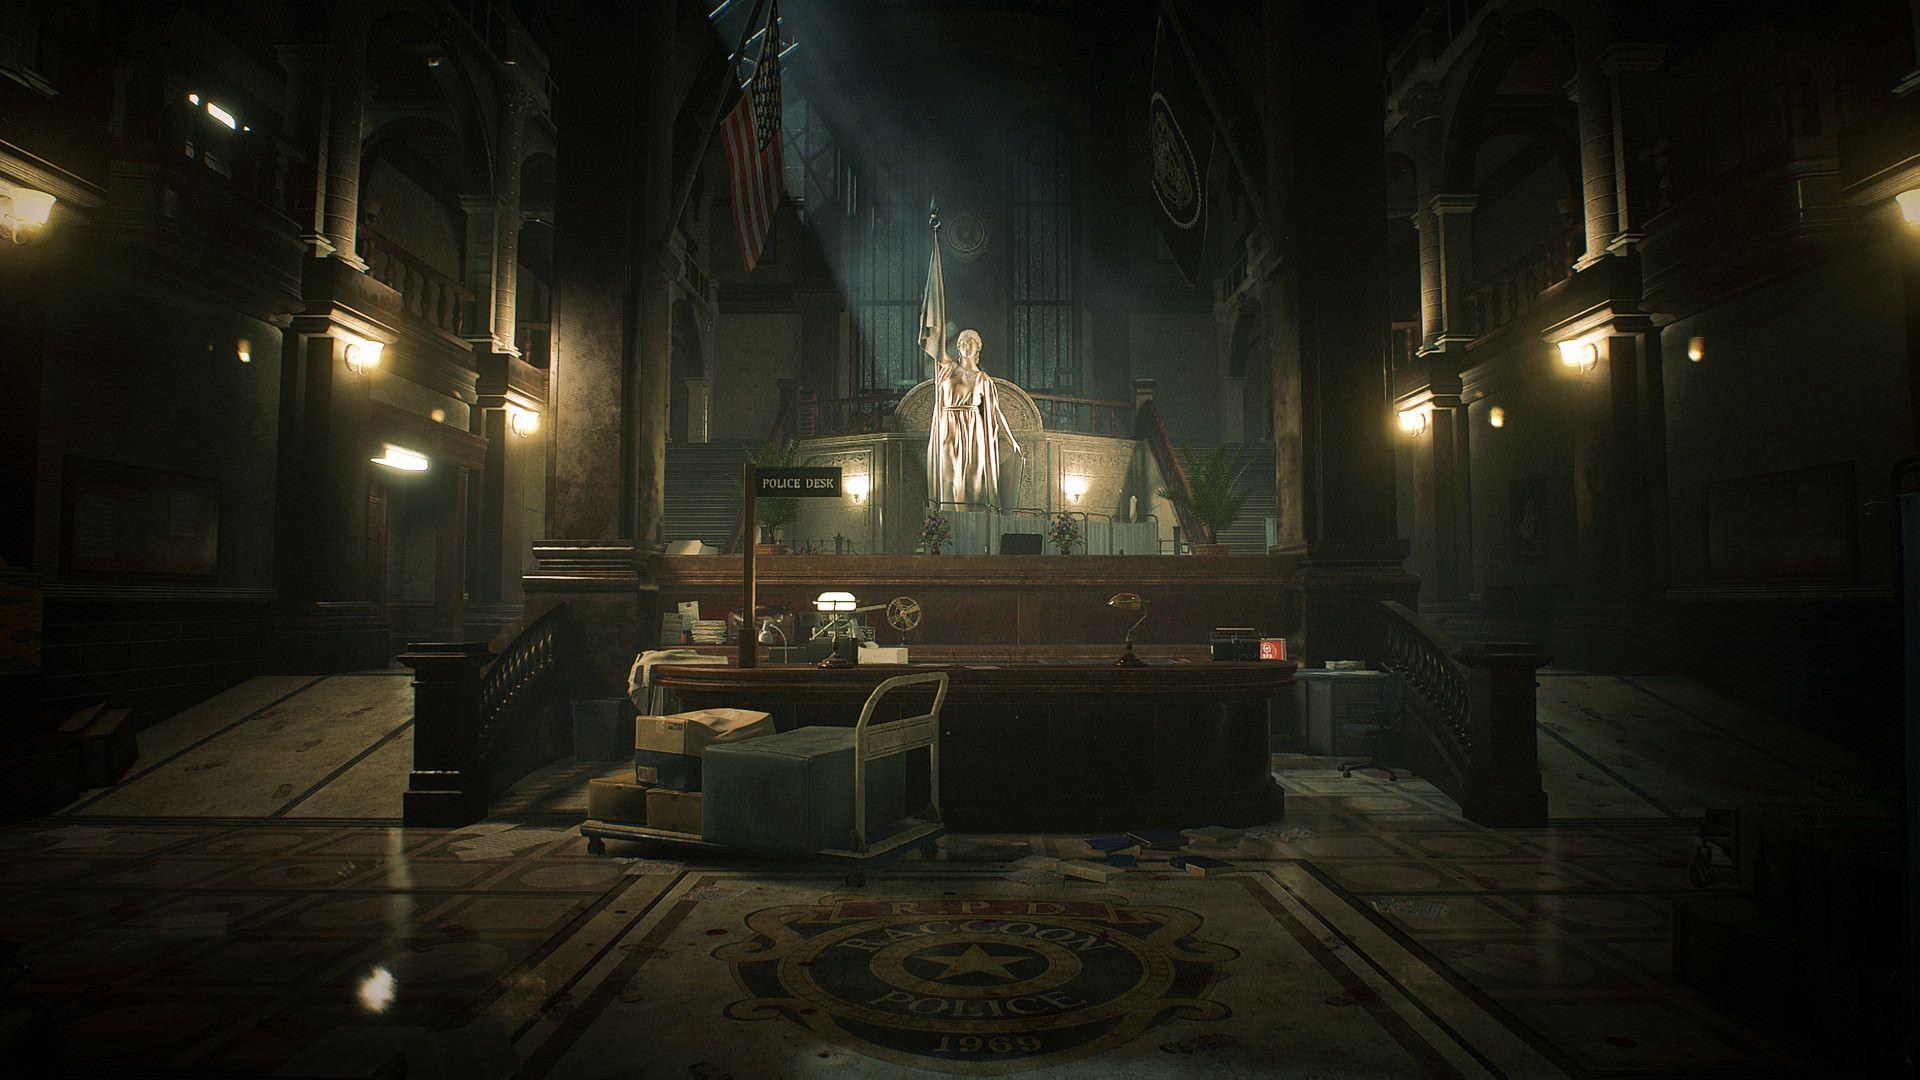 Resident Evil 2 Remake Wallpapers - Wallpaper Cave